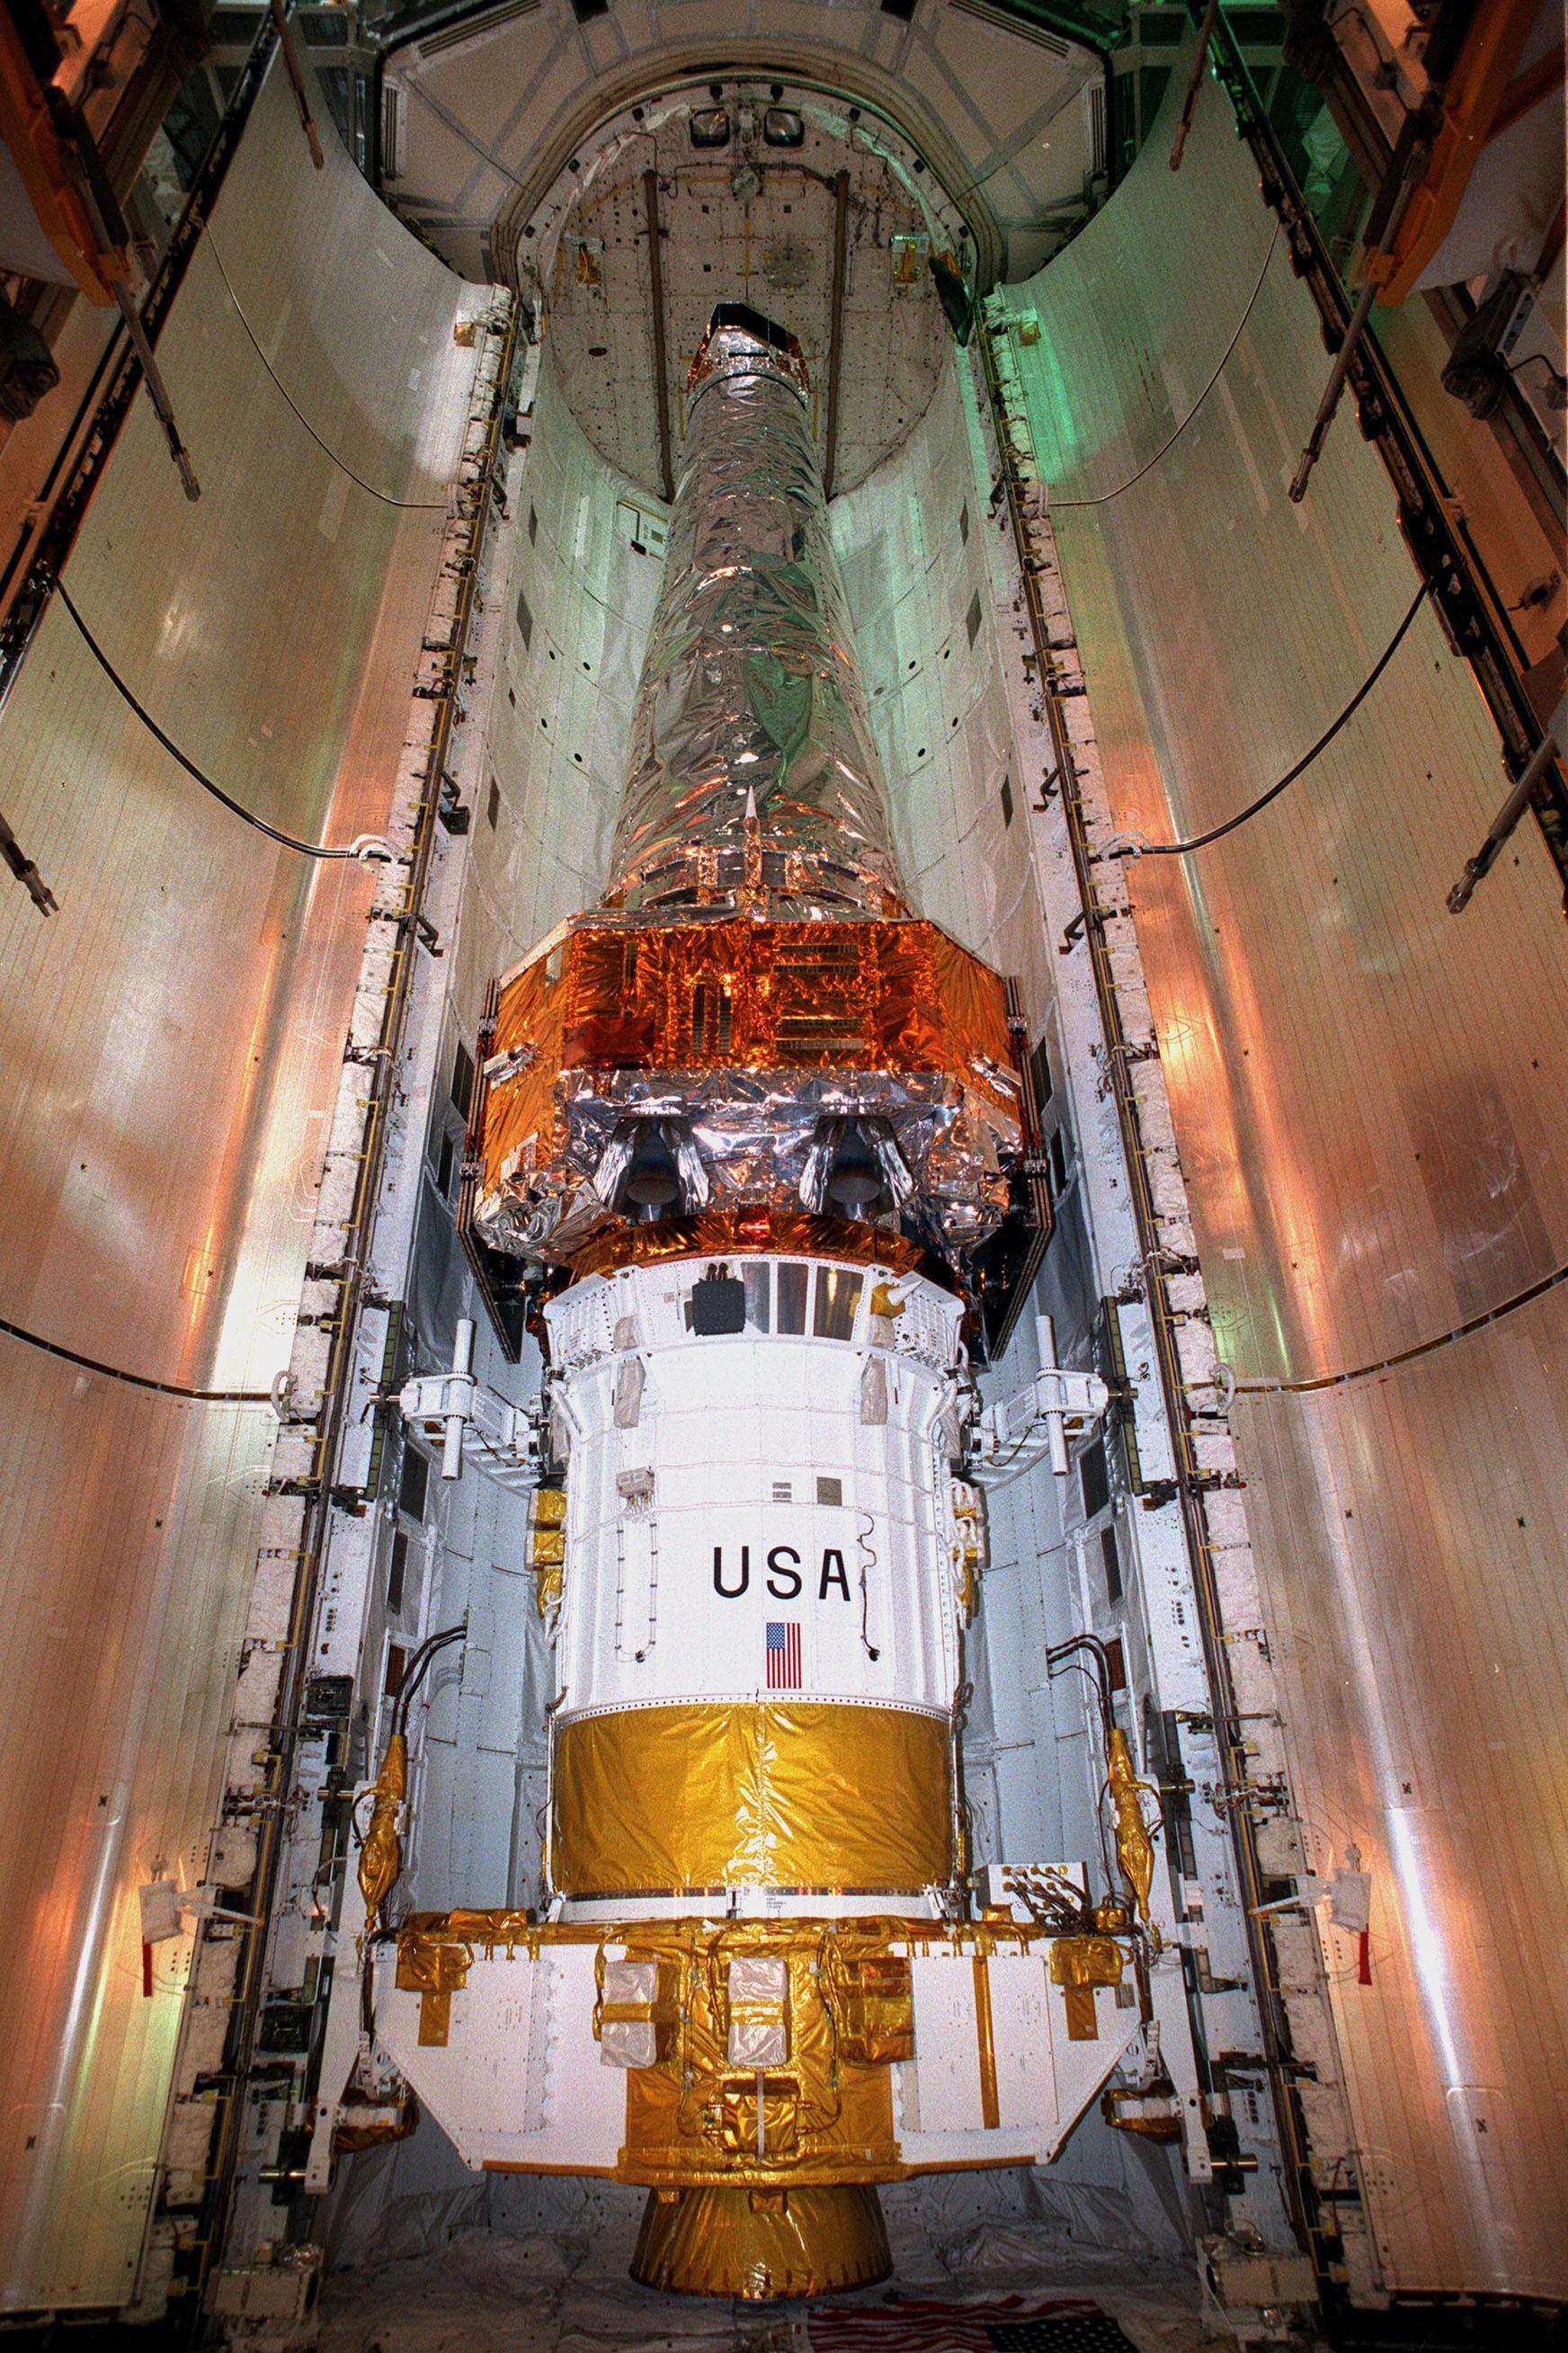 space shuttle columbia inside - photo #6